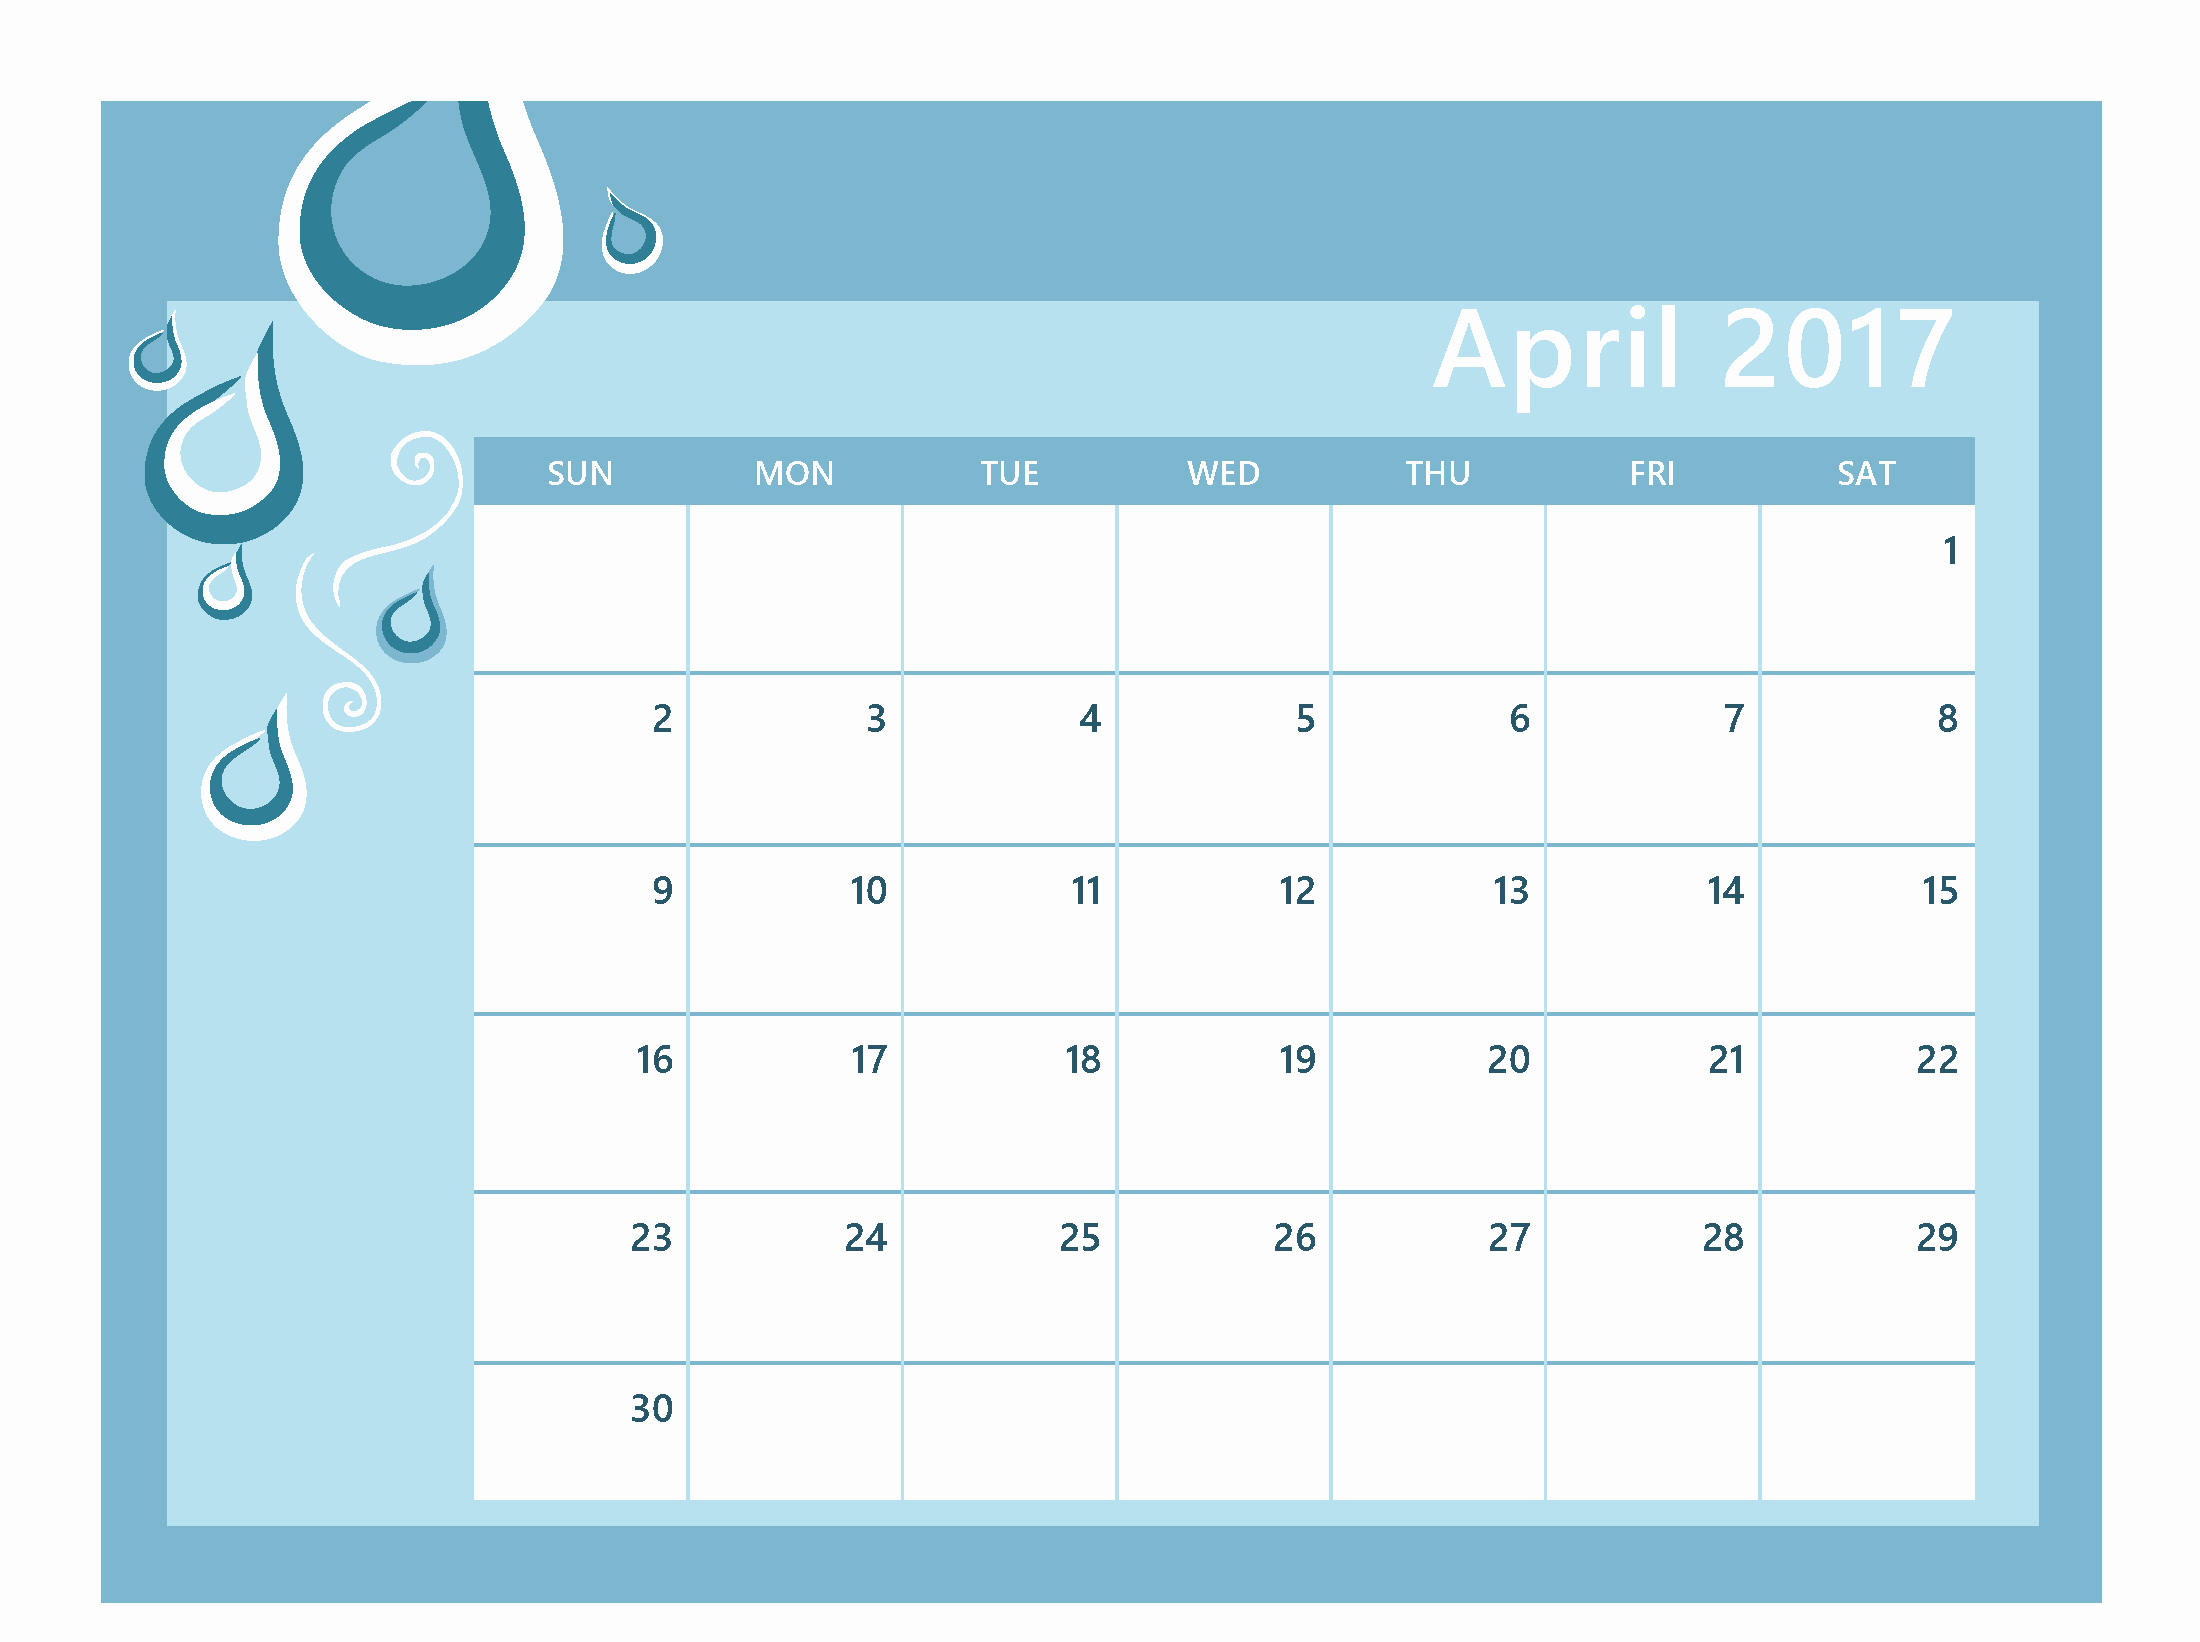 Free Editable Printable Calendar 2017 New April 2017 Calendar Editable Calendar and